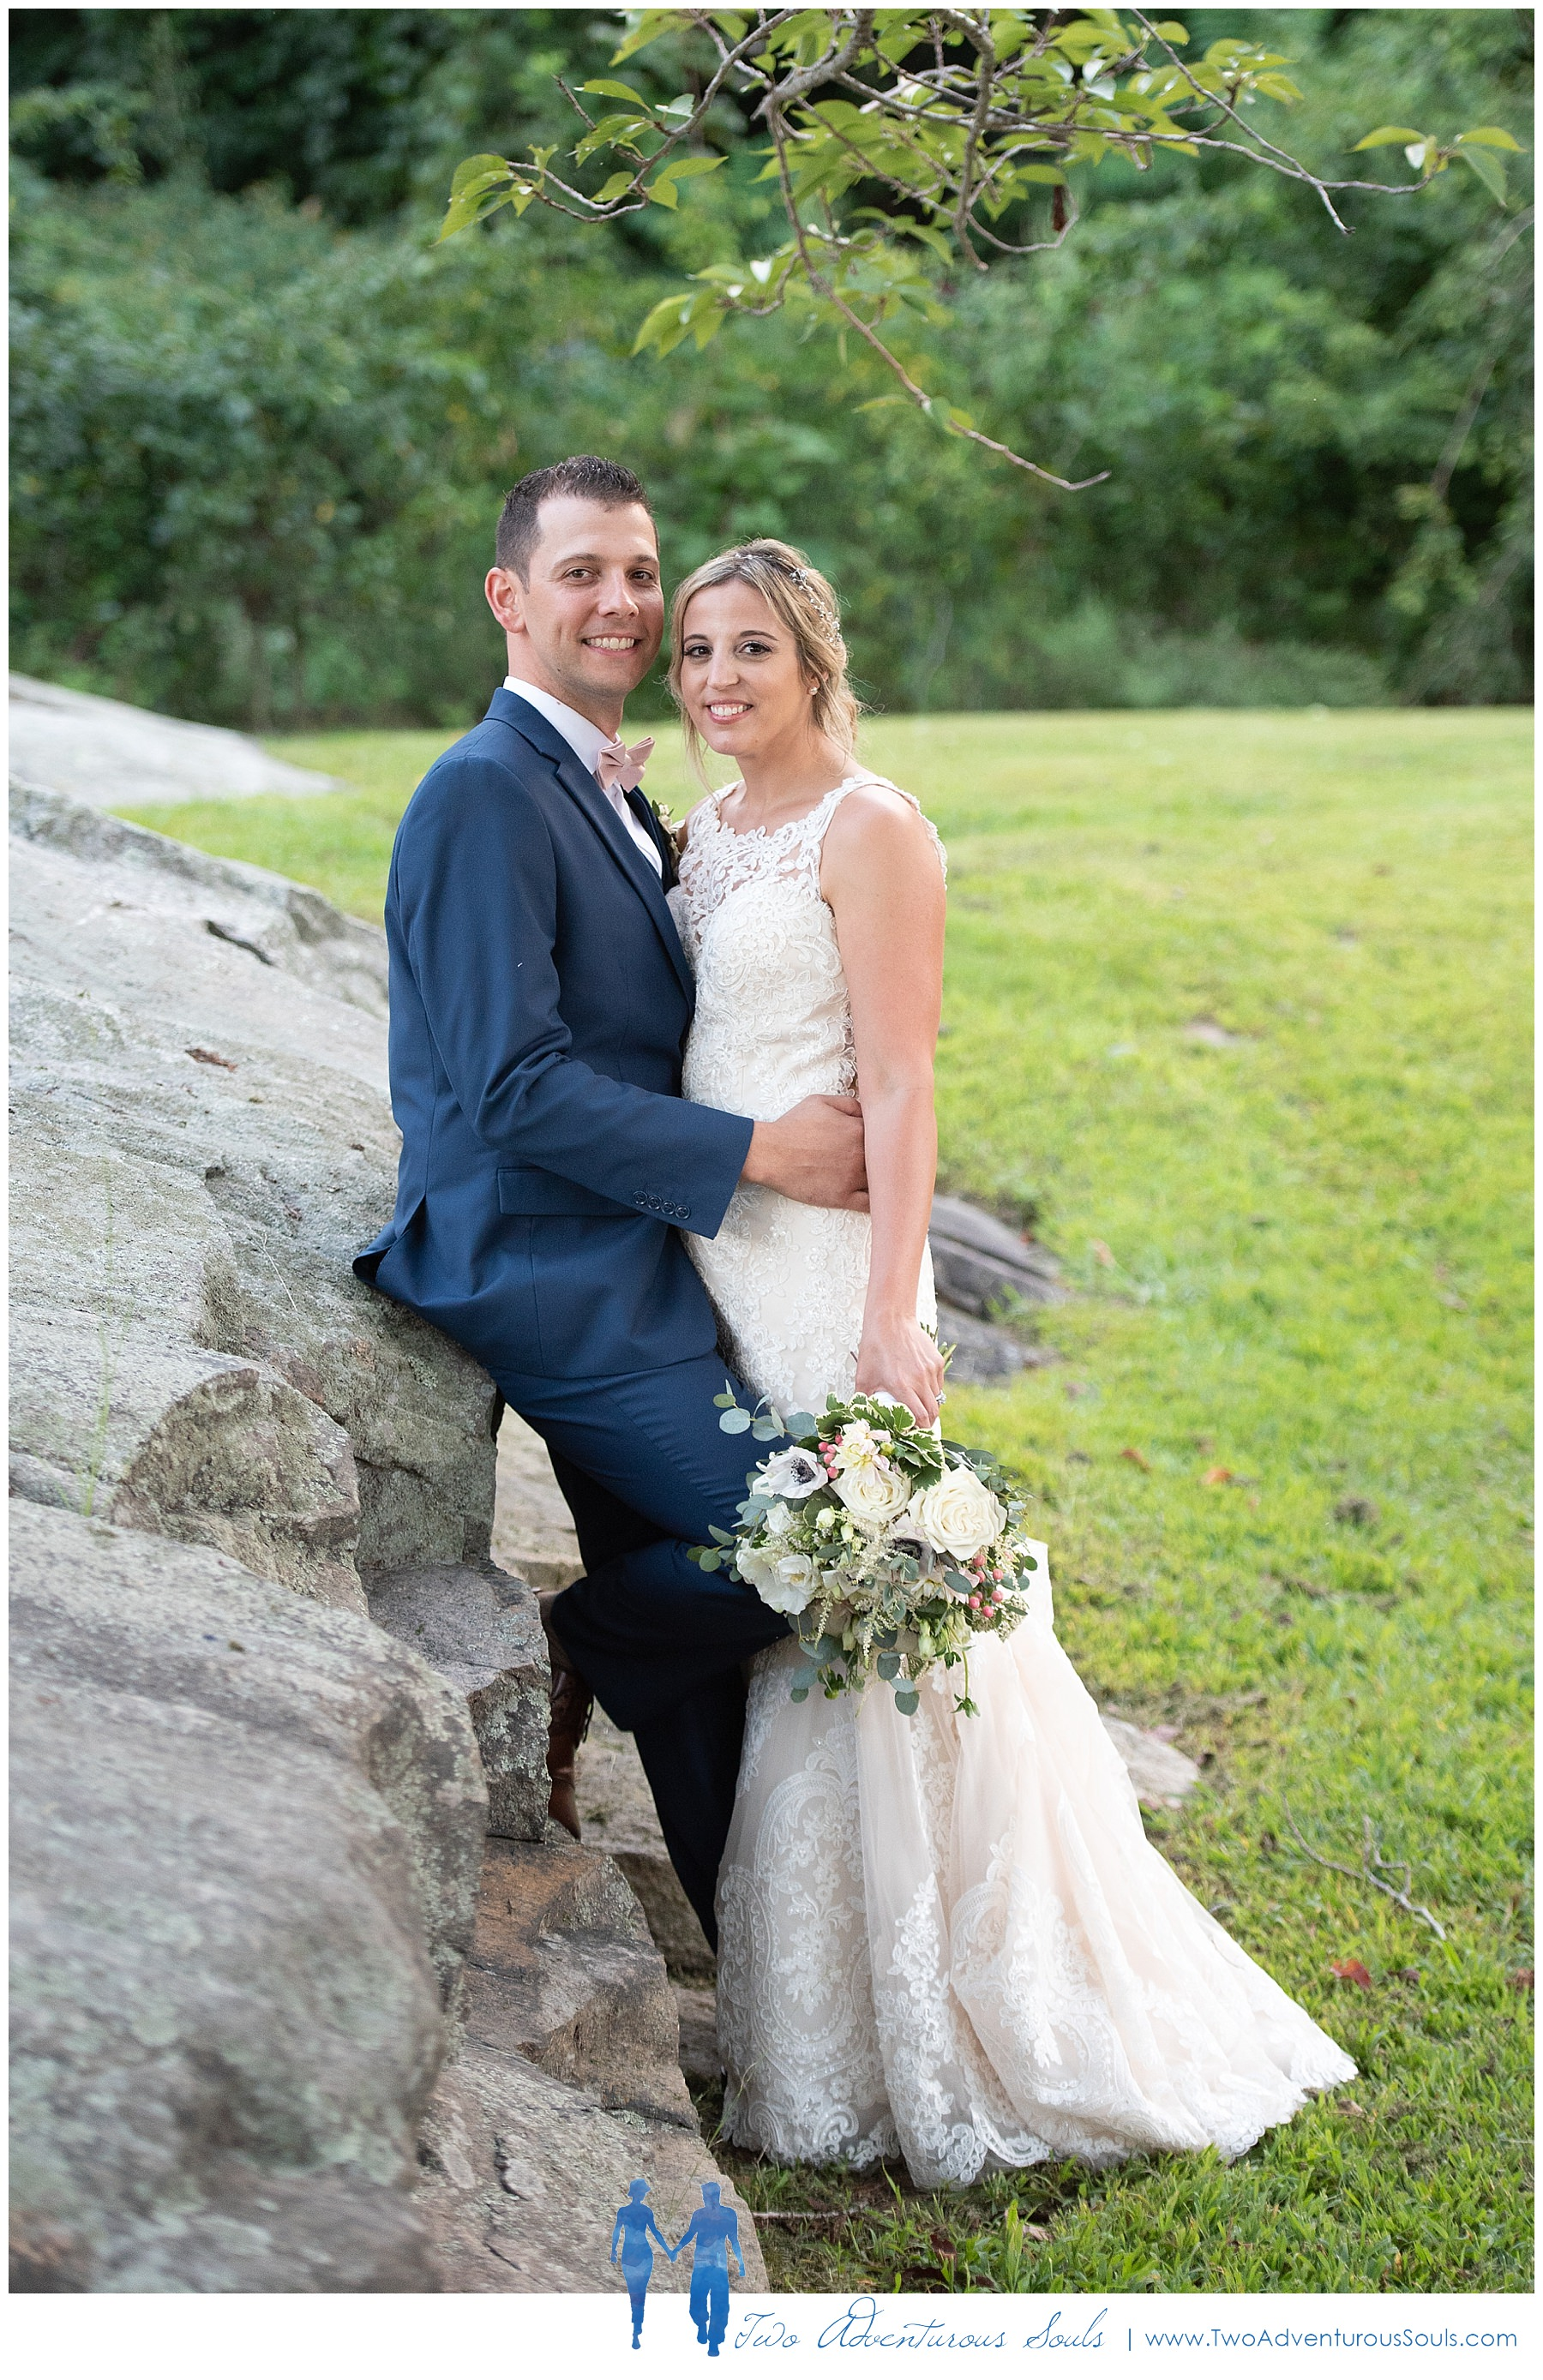 Connecticut Wedding Photographers, Lace Factory Wedding Photographers, Two Adventurous Souls - 083119_0046.jpg